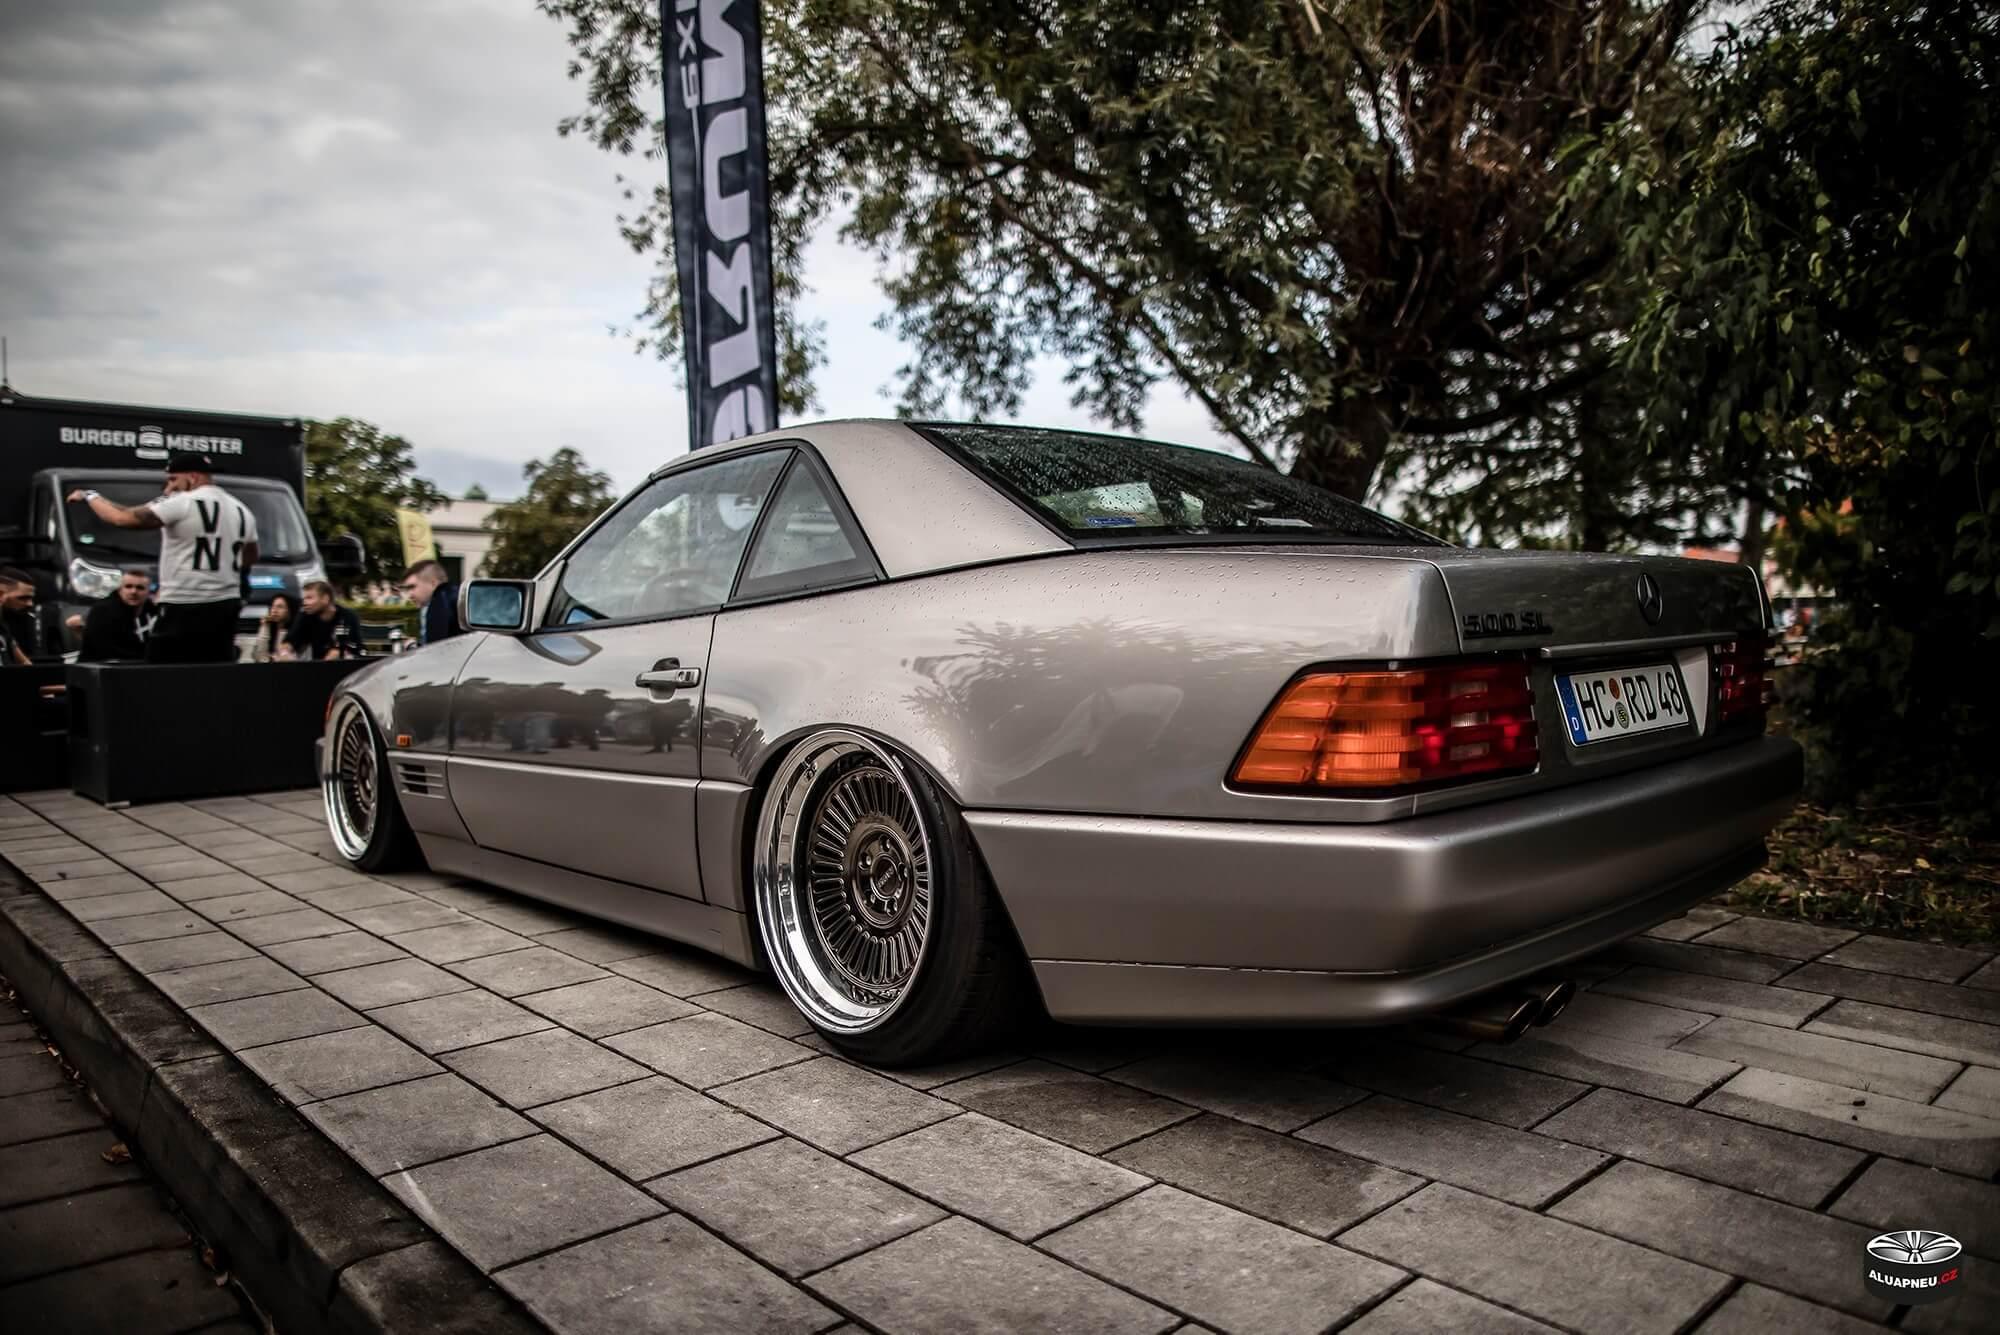 Límcové elektrony Mercedes Benz SL - XS Classic Carnight 5.0 - Drážďany tuning sraz 2019 - www.aluapneu.cz